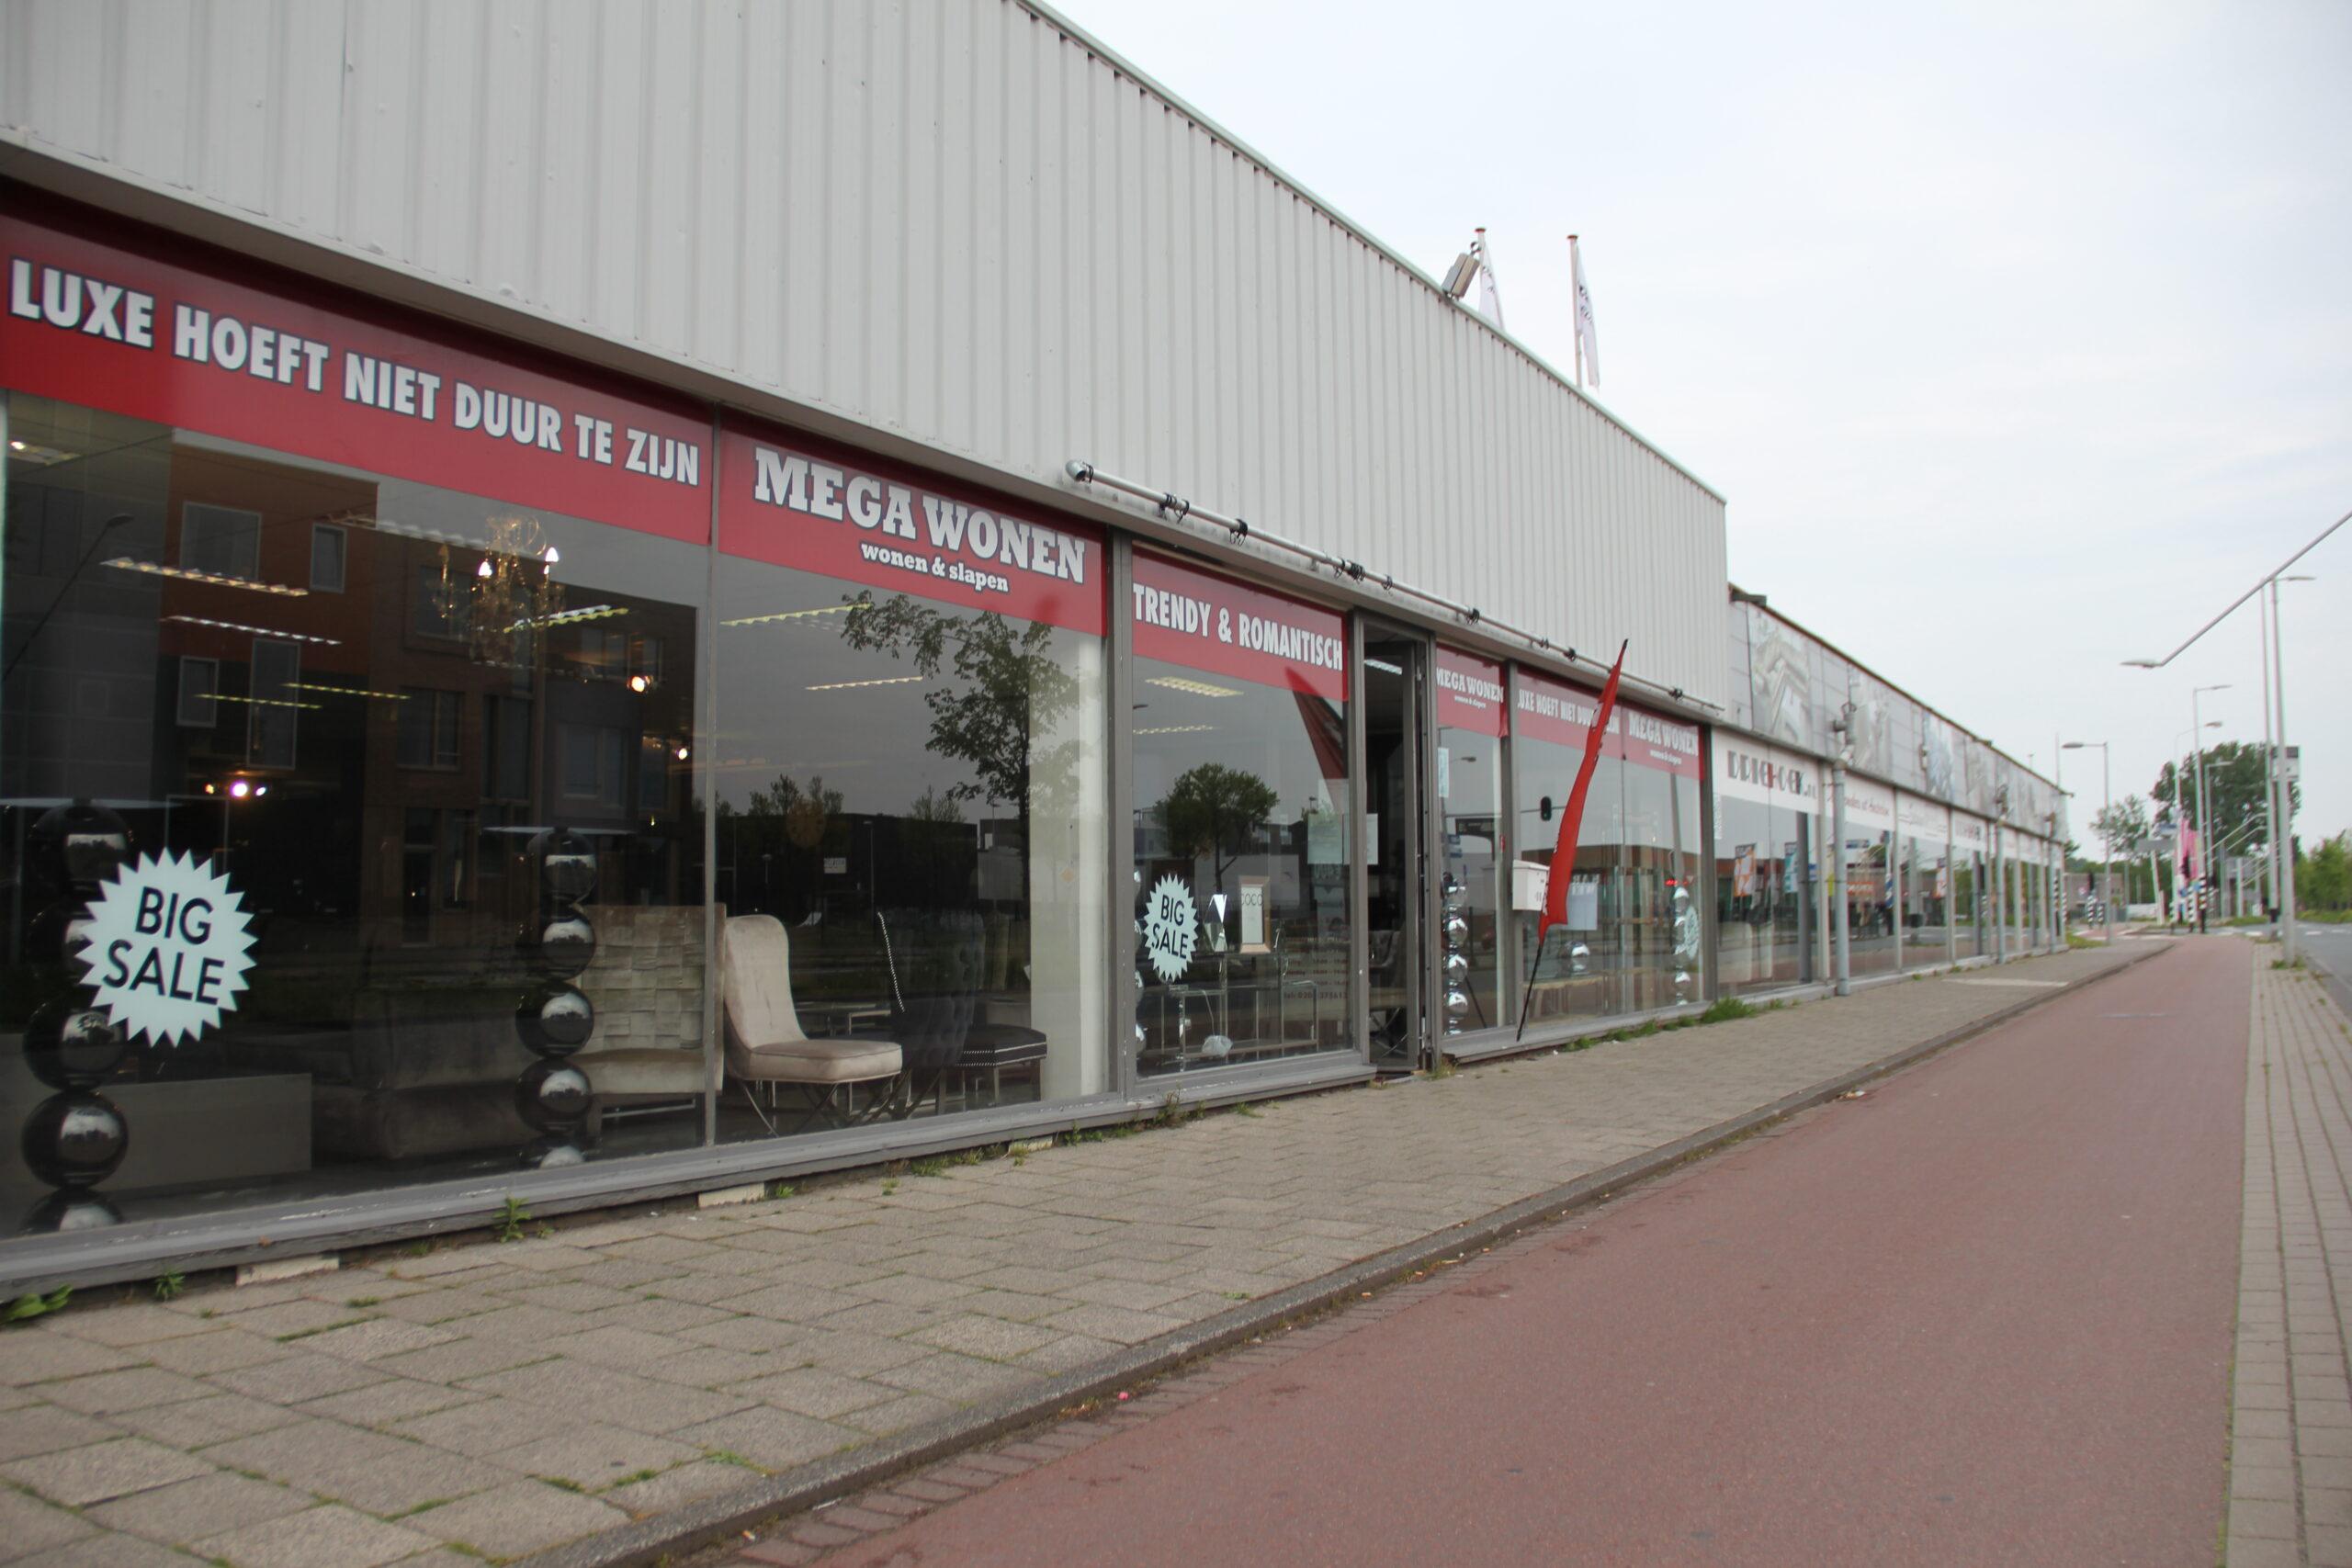 driehoek meubelen amsterdam